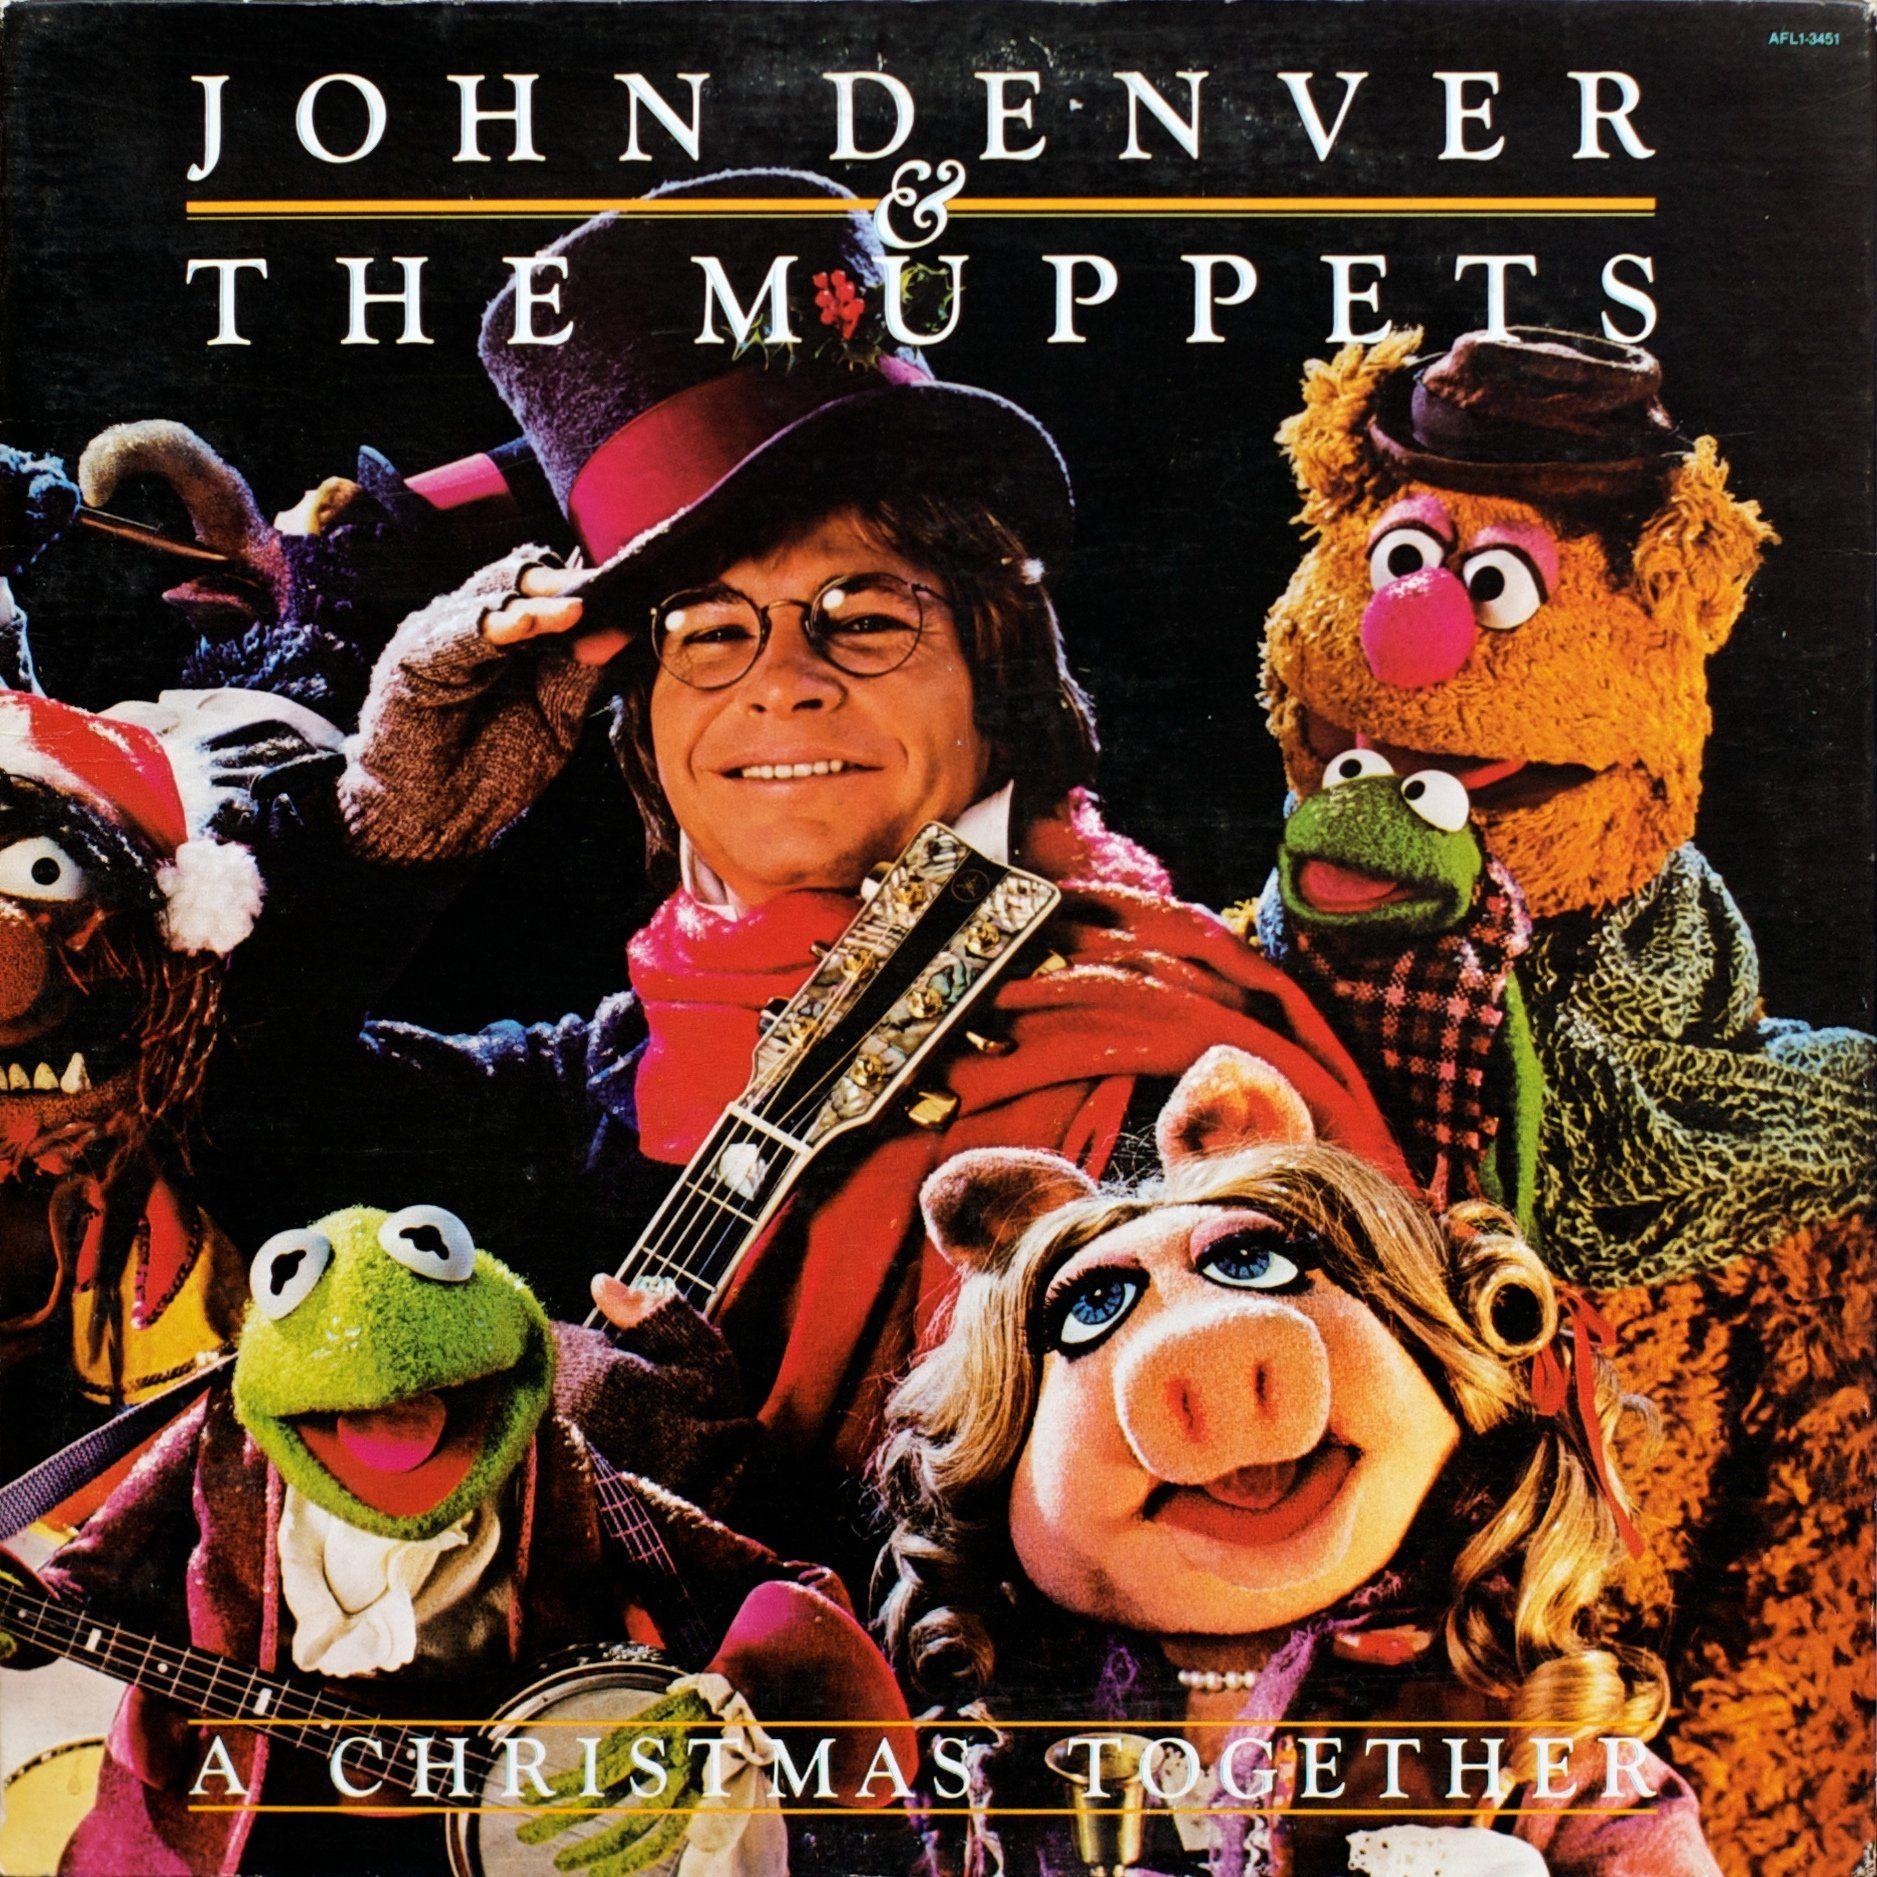 John Denver The Muppets A Christmas Together Muppets John Denver Christmas John Denver